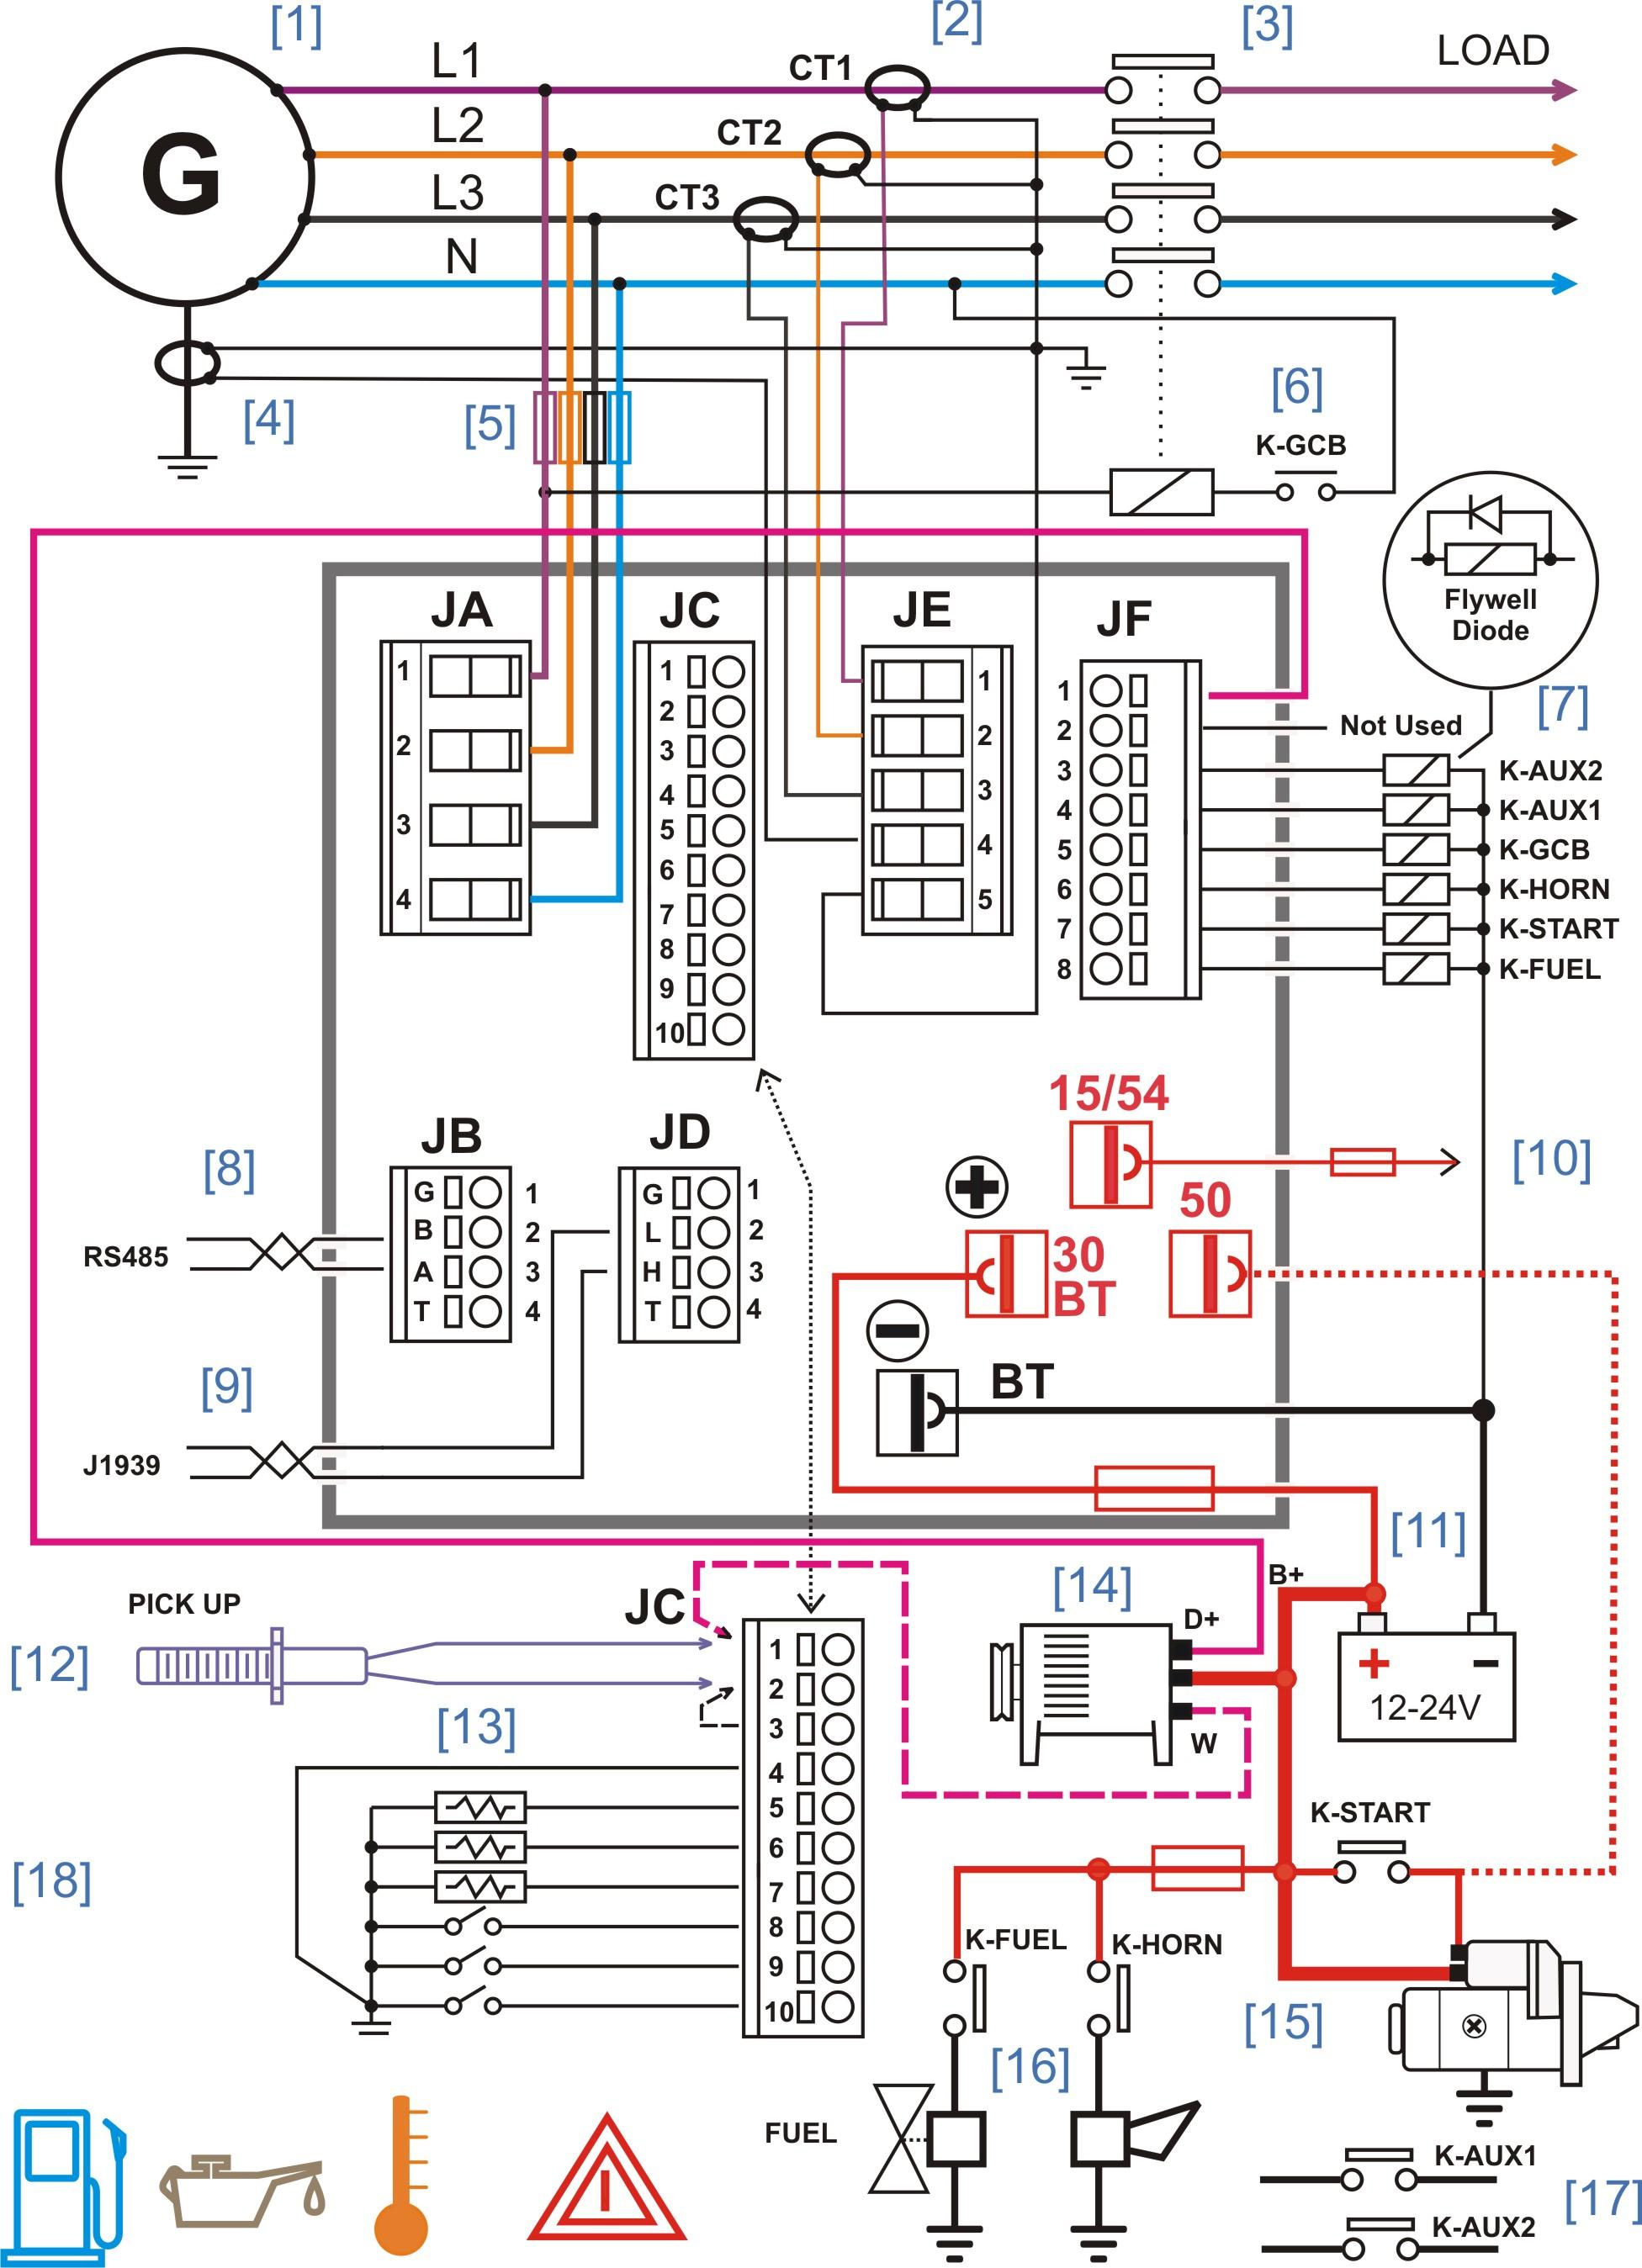 Wiring Diagram Maker   Wiring Diagram - Home Wiring Diagram Software